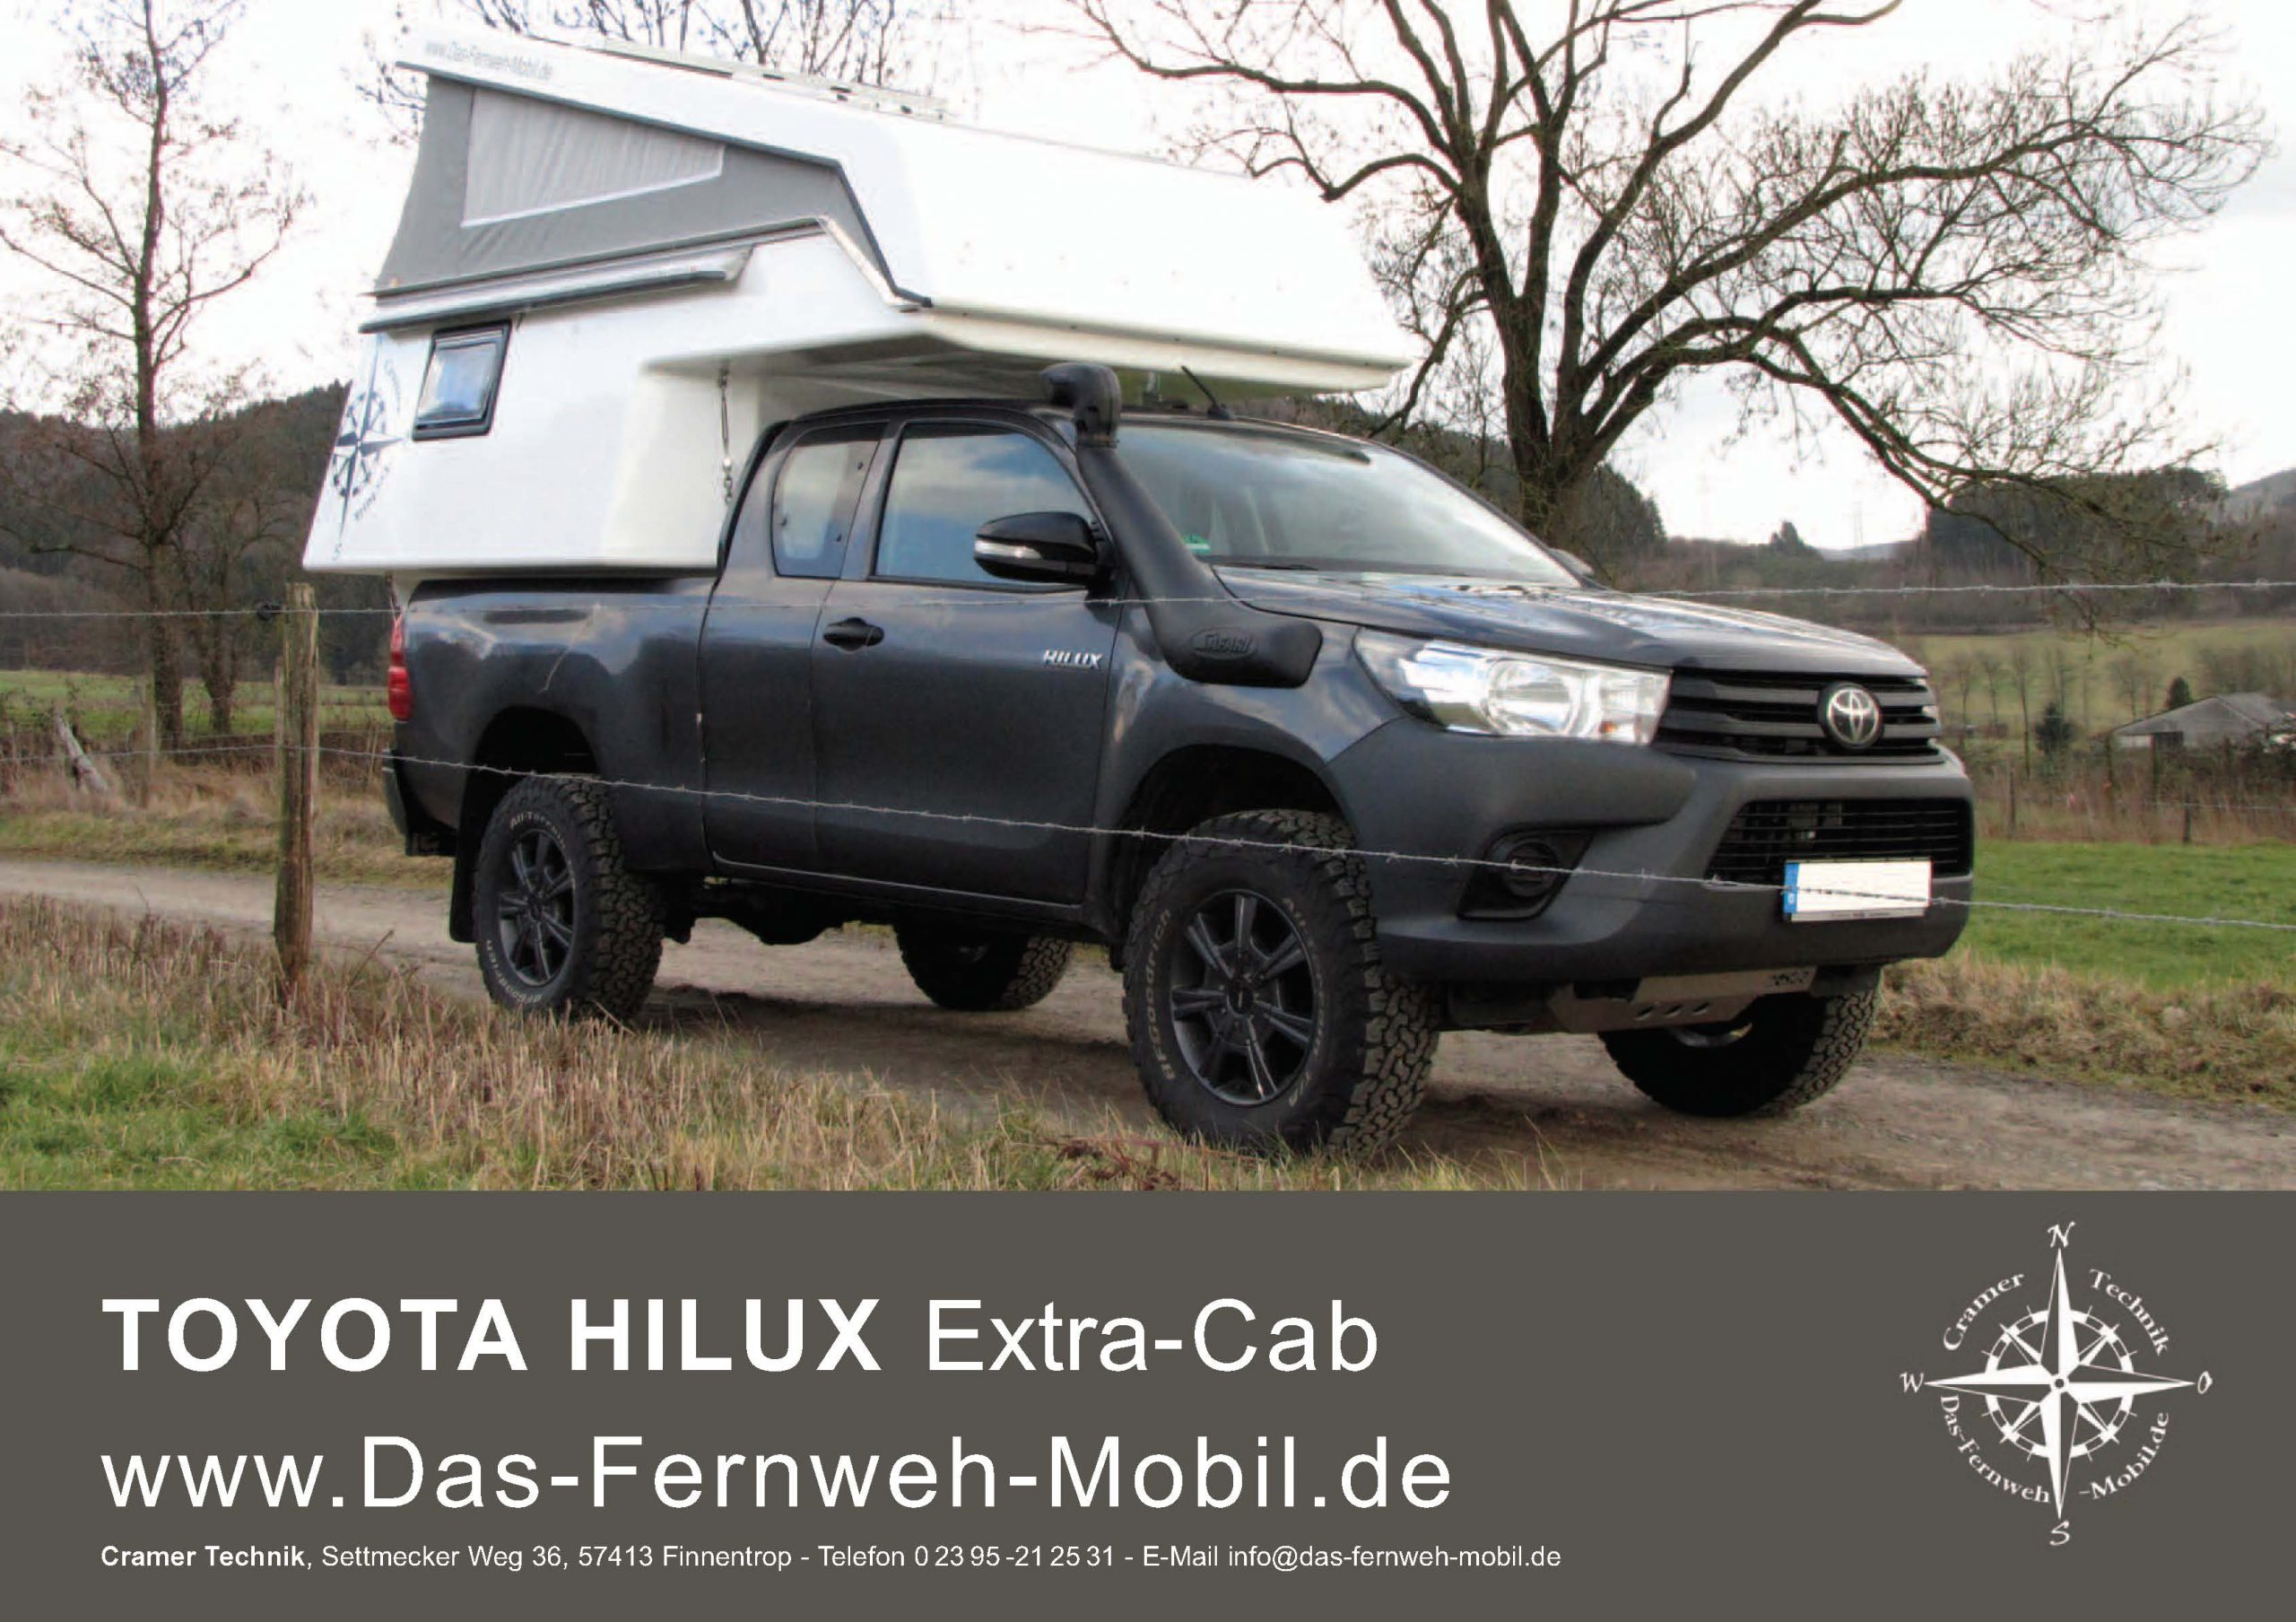 Datenblatt-Toyota-Hilux-Extra-Cab-102019-k_Seite_1